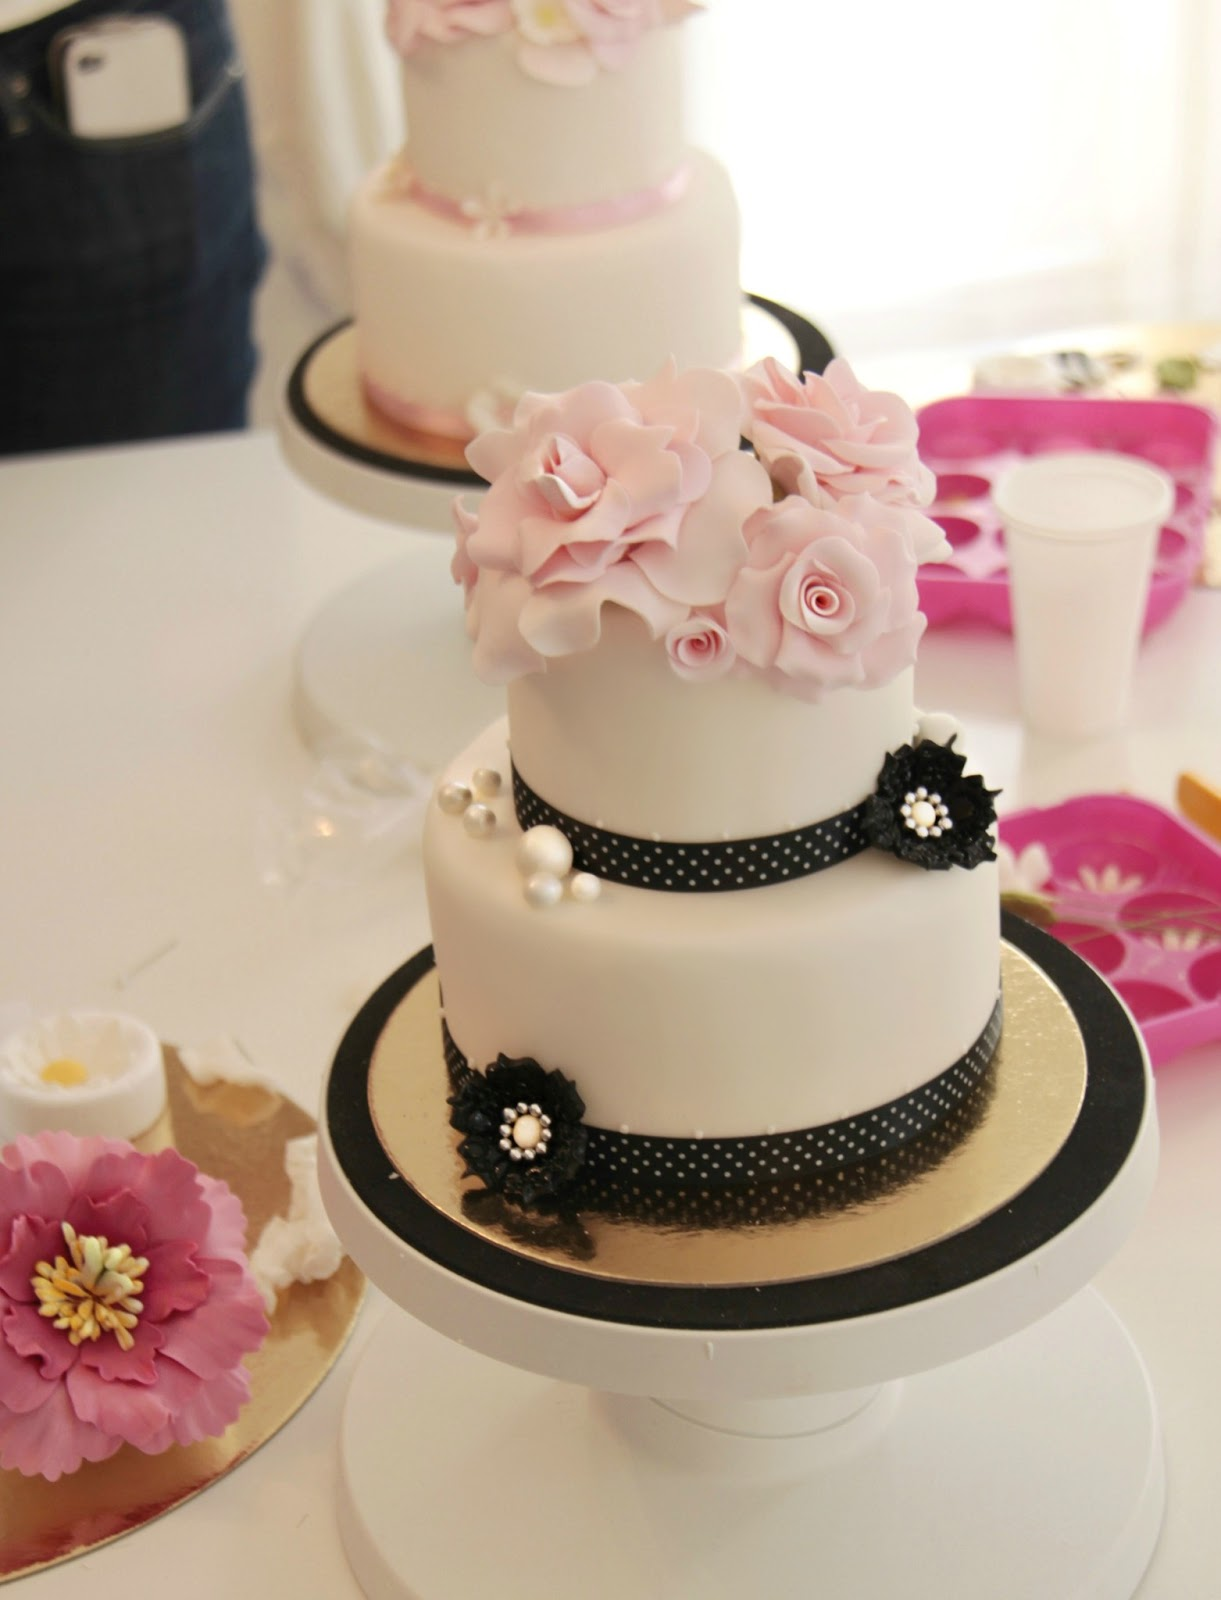 decoracion de cakes con fondant